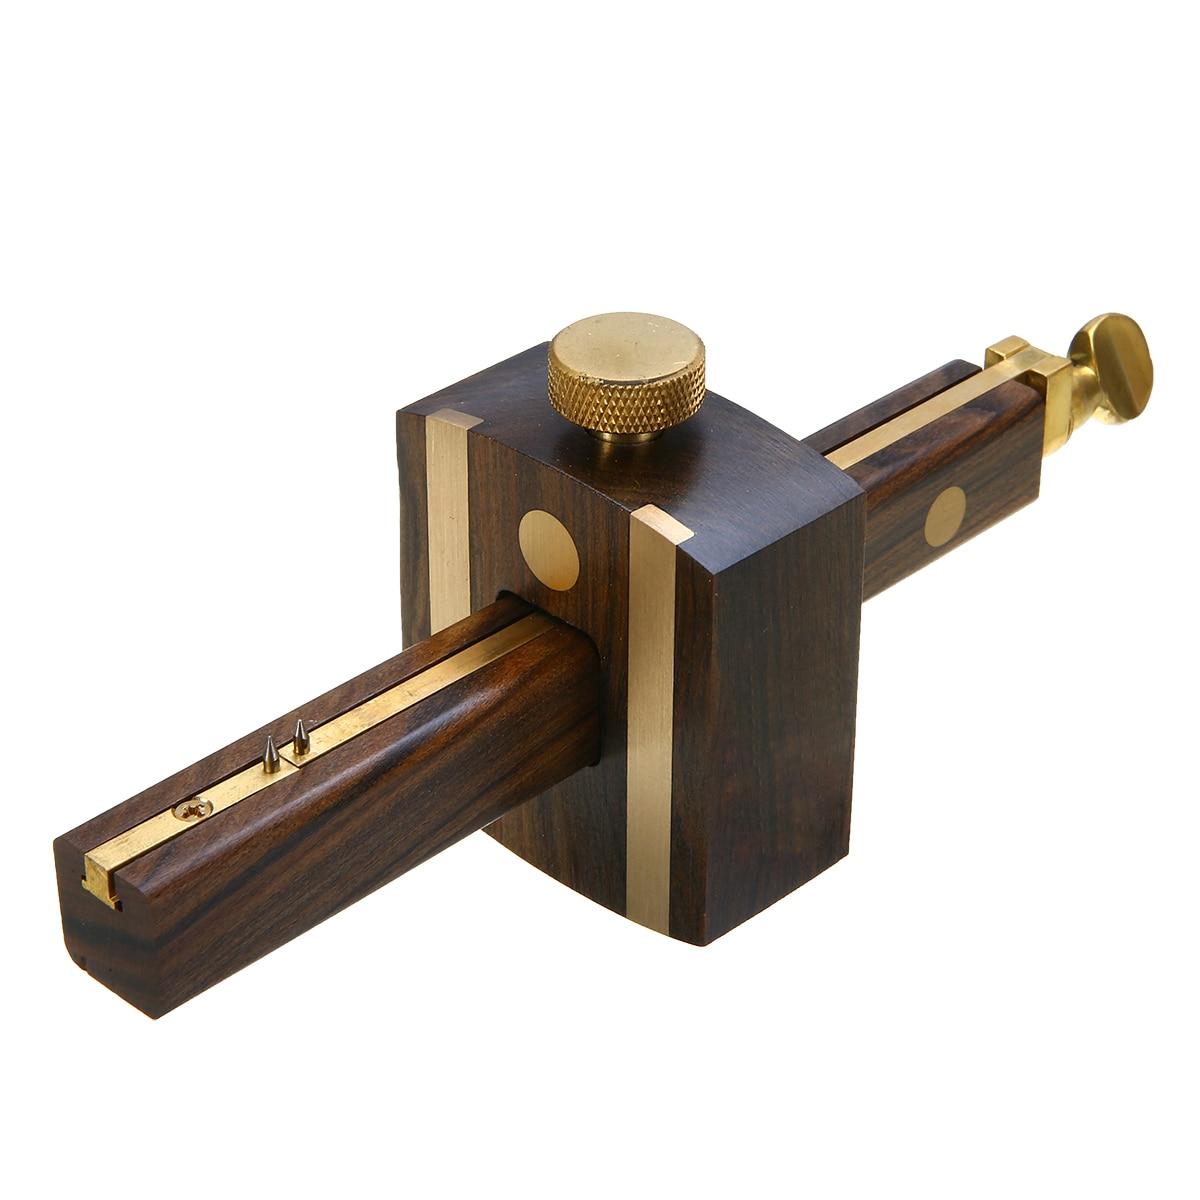 Marking Gauge 8inch Cutting Gauge Wood Scribe Mortise Gauge With Brass Screw Measuring Woodworking Tool цена